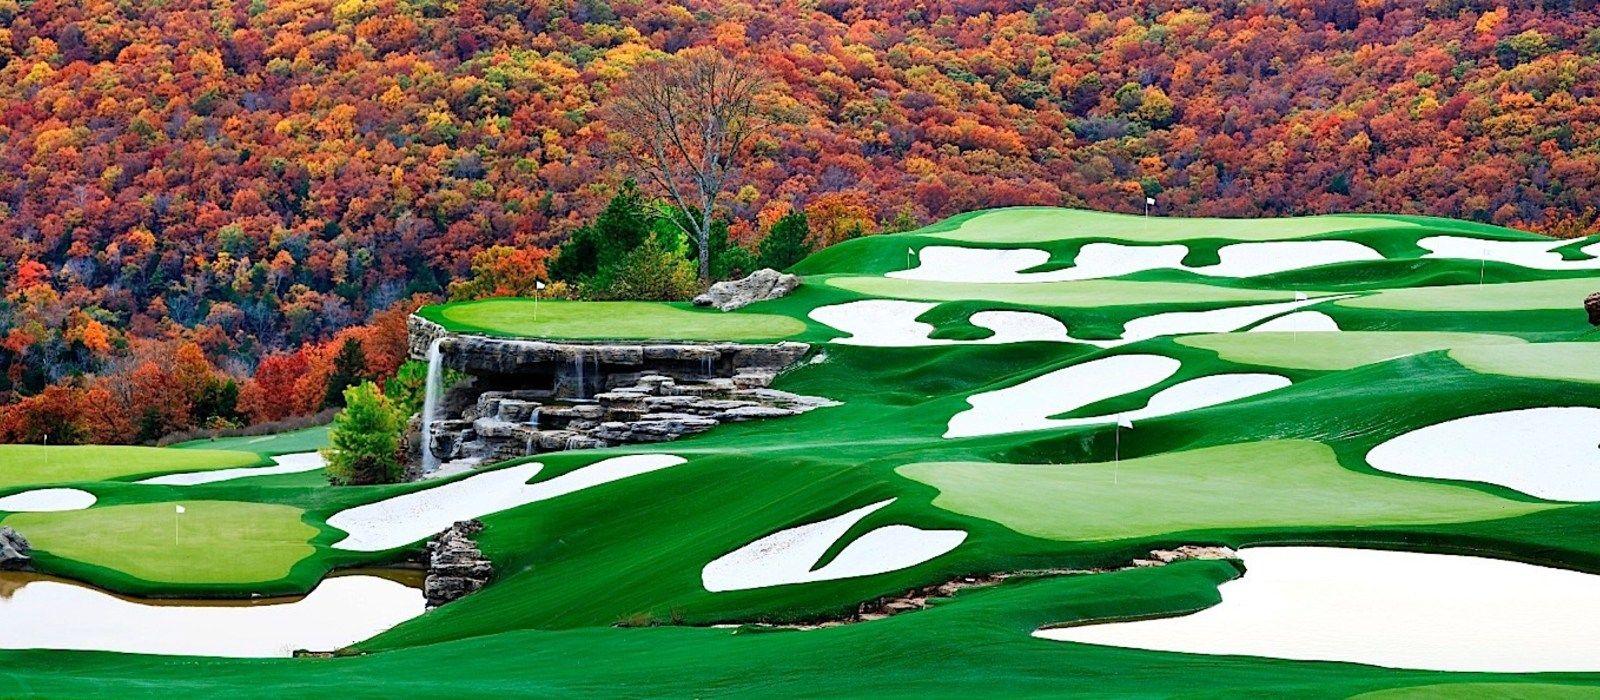 Golf Big cedar lodge branson, Vacation spots, The rock